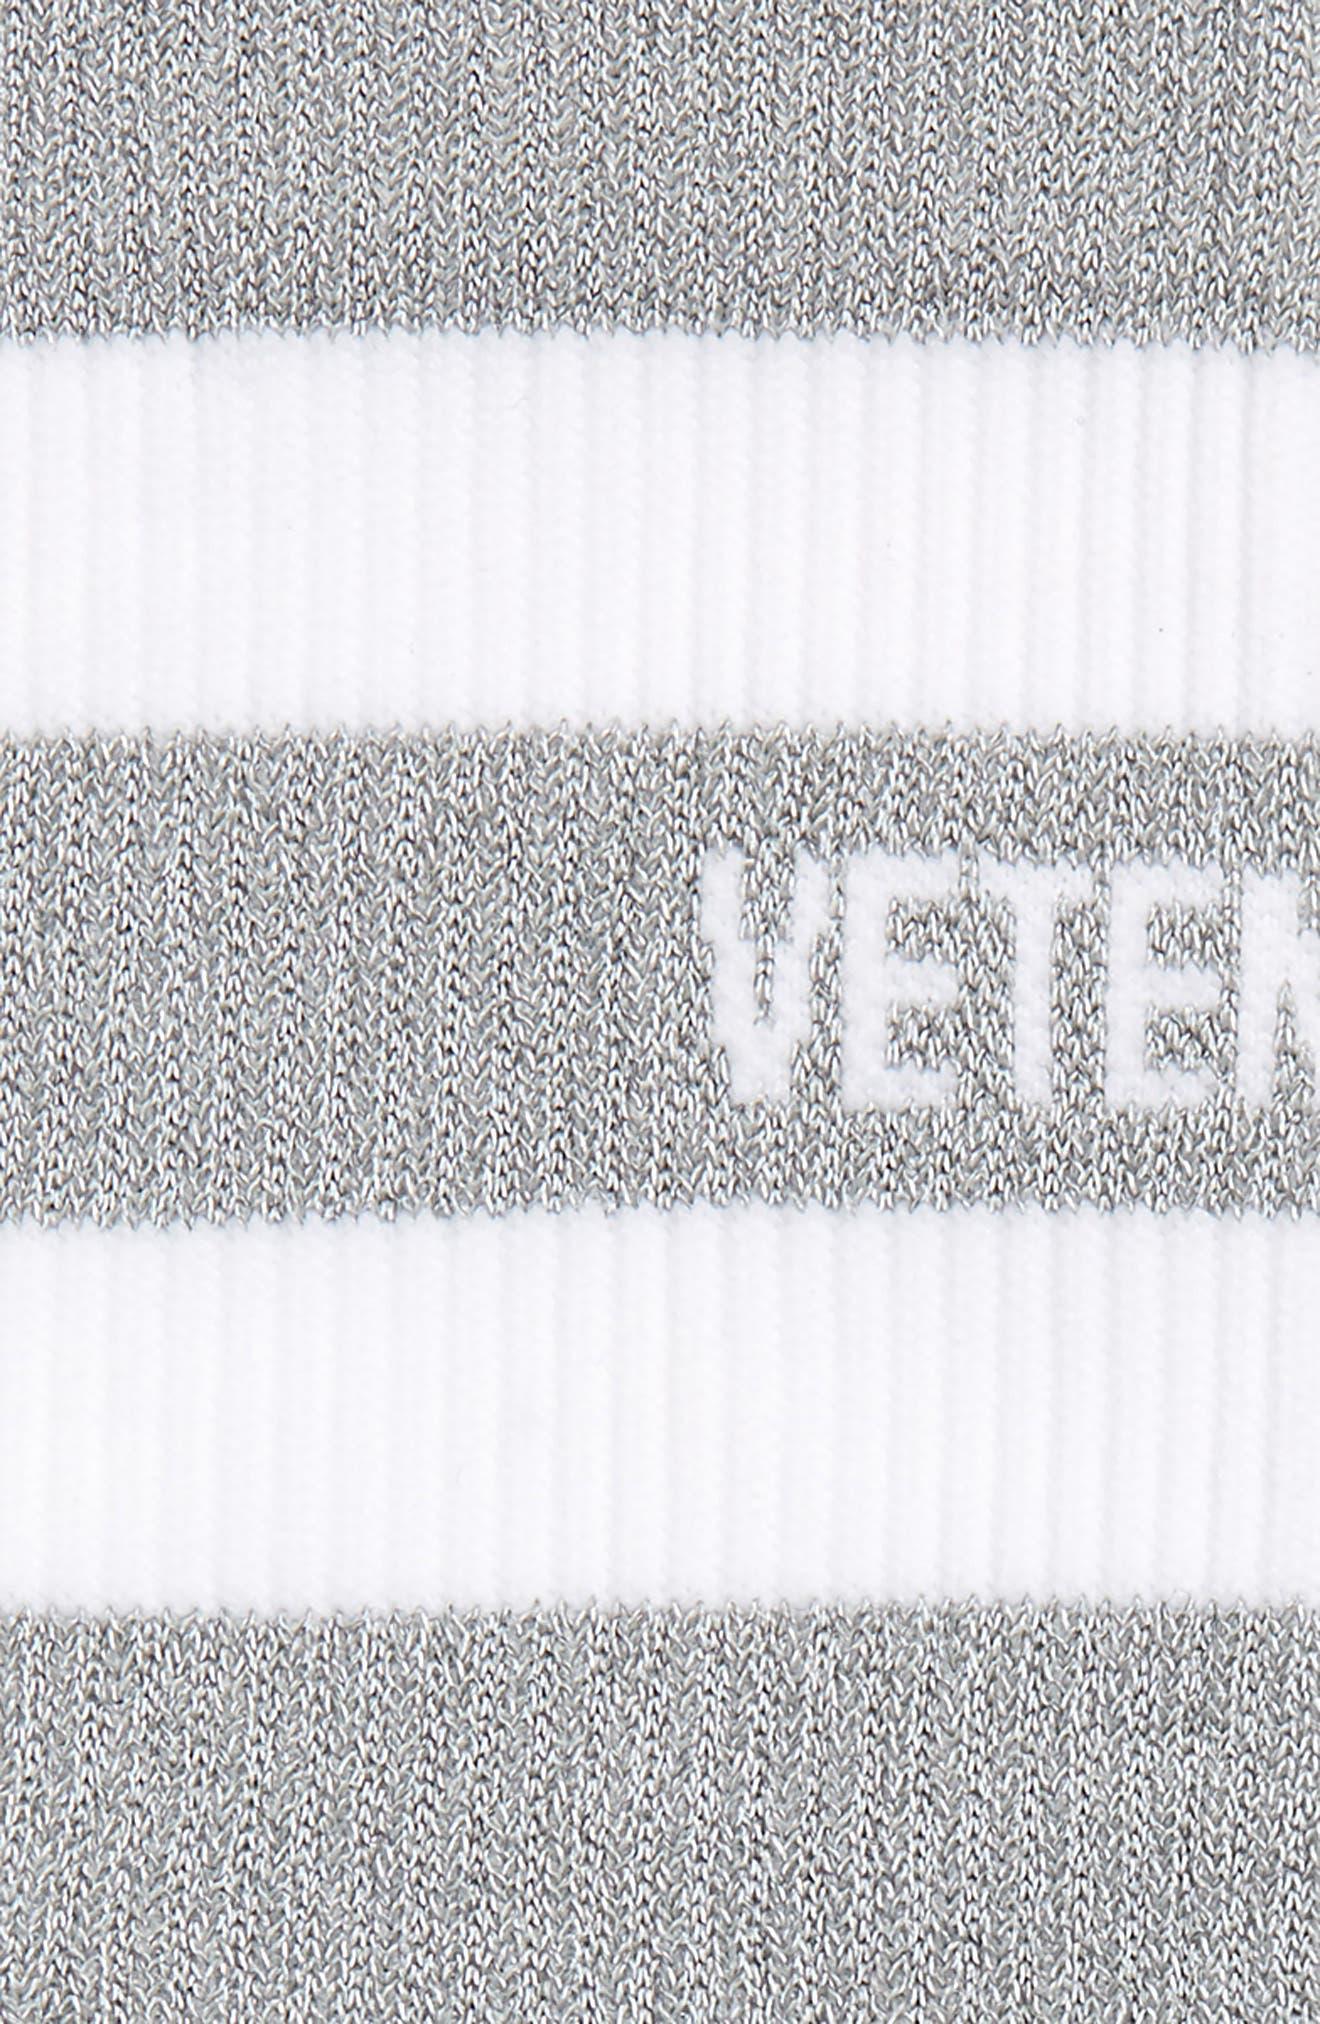 Reflective Socks,                             Alternate thumbnail 3, color,                             020